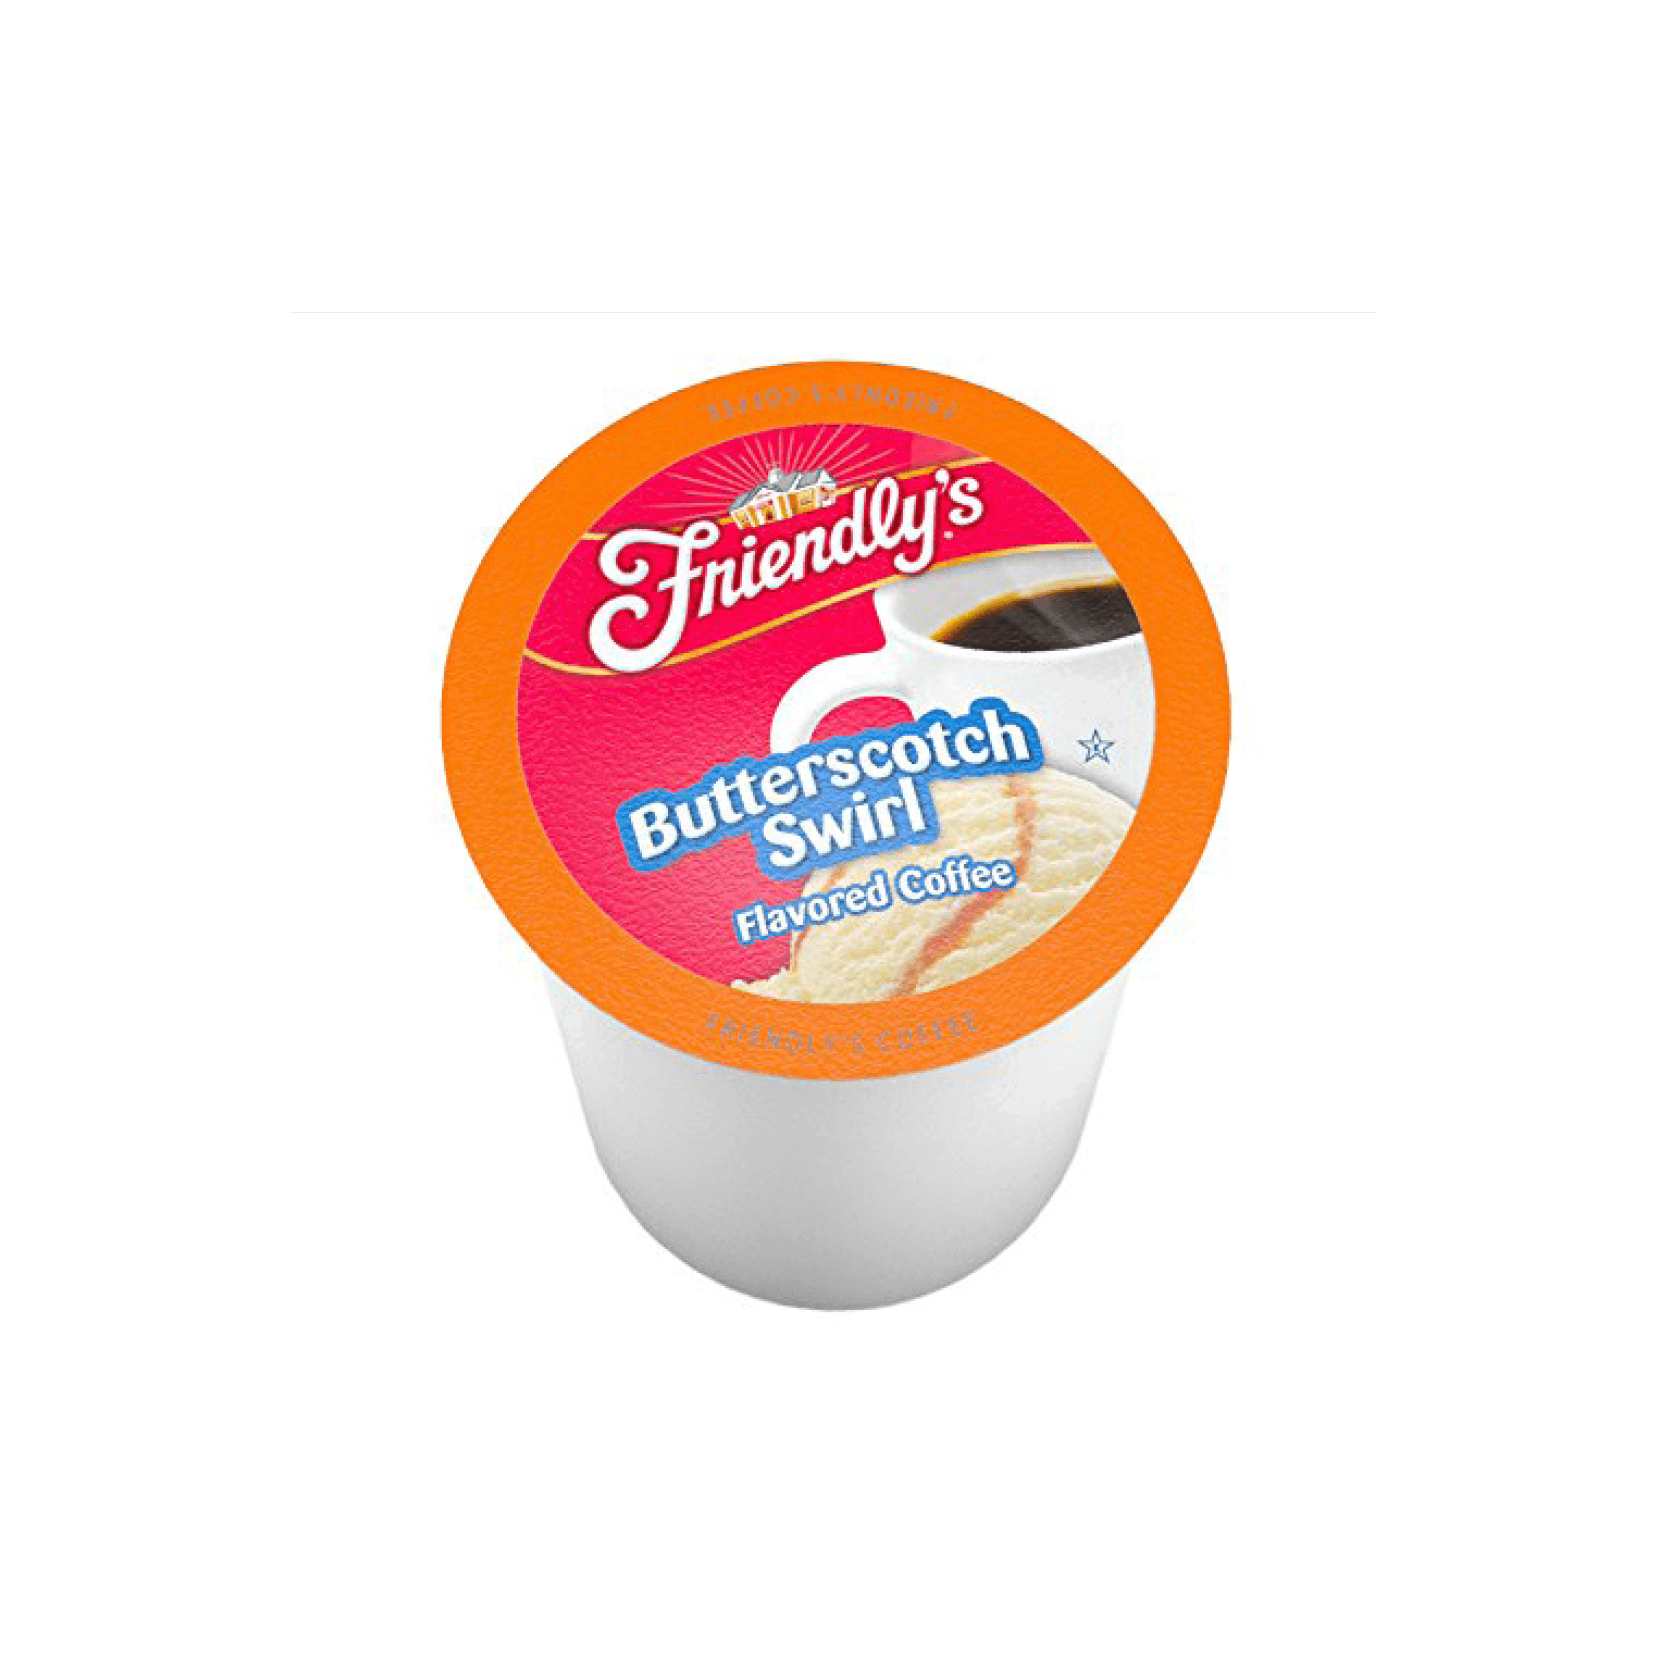 Butterscotch Swirl Coffee